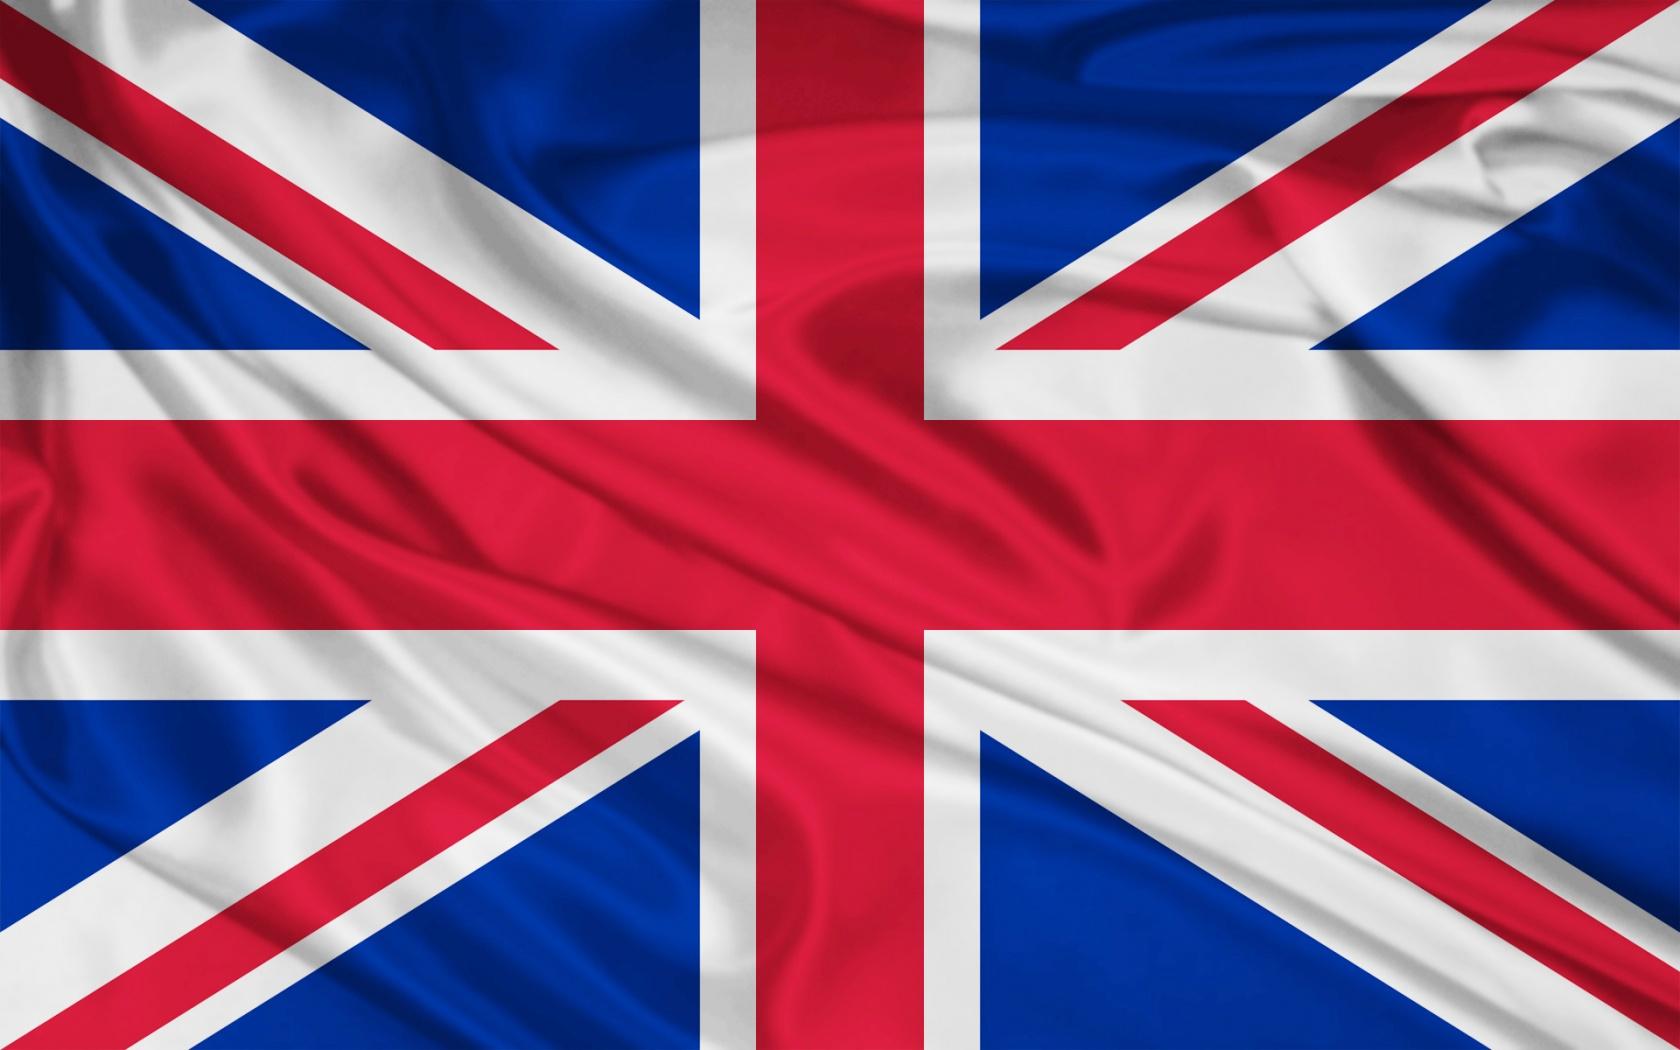 1680x1050 United Kingdom Flag desktop PC and Mac wallpaper 1680x1050